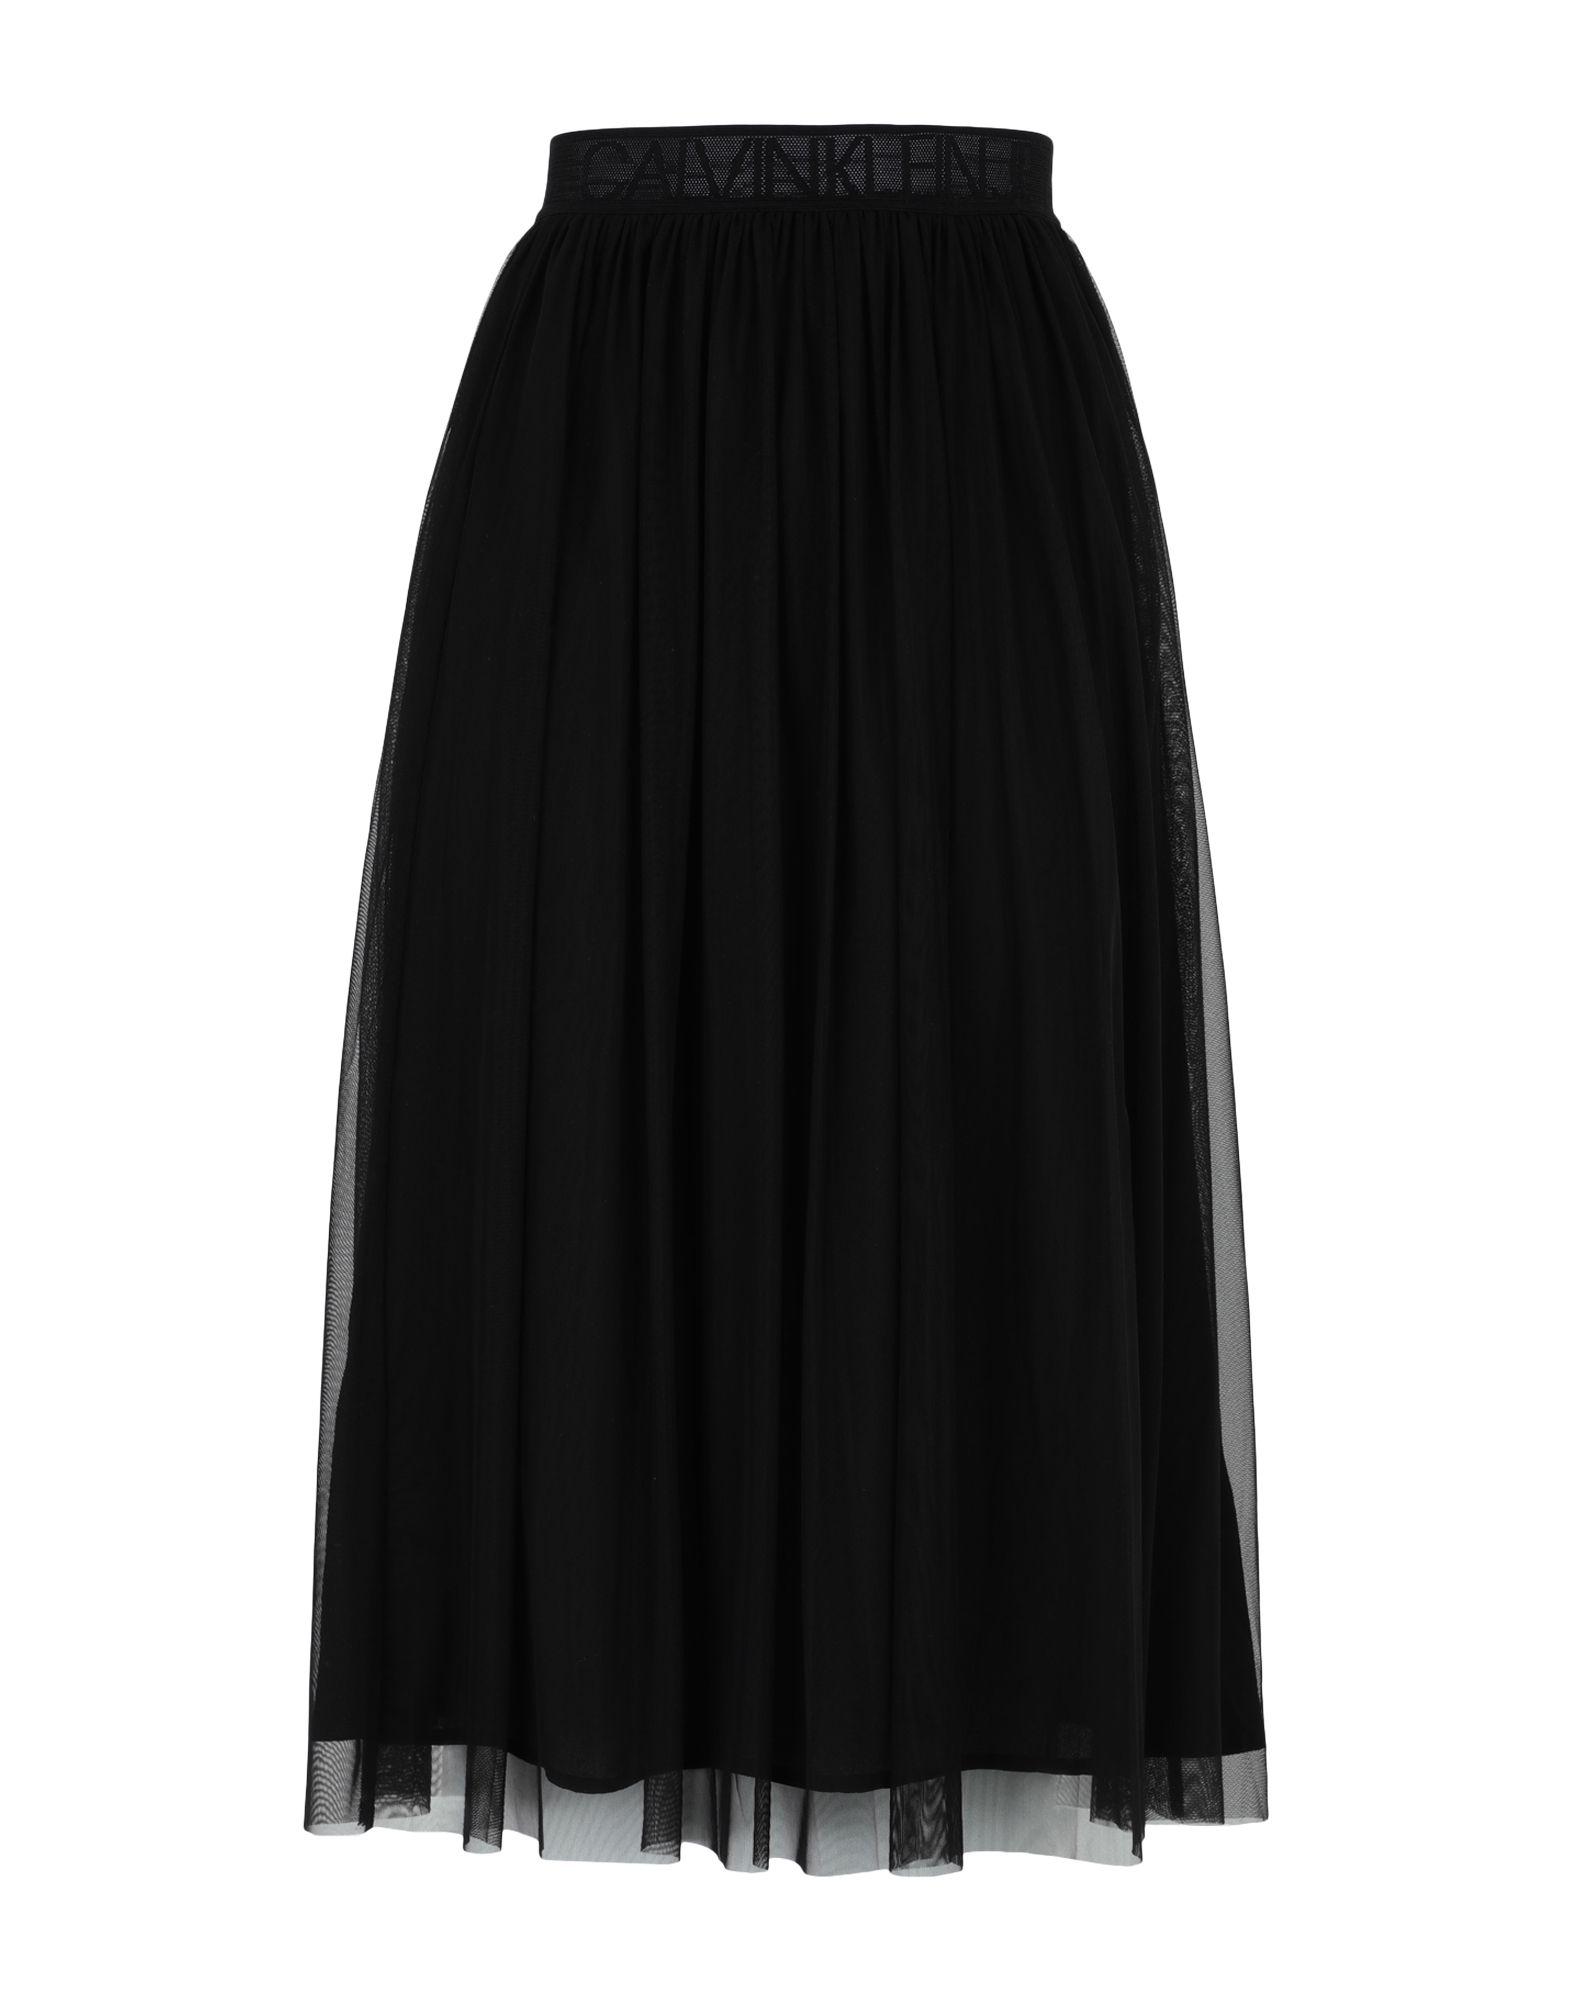 Фото - CALVIN KLEIN JEANS Юбка длиной 3/4 calvin klein collection юбка длиной 3 4